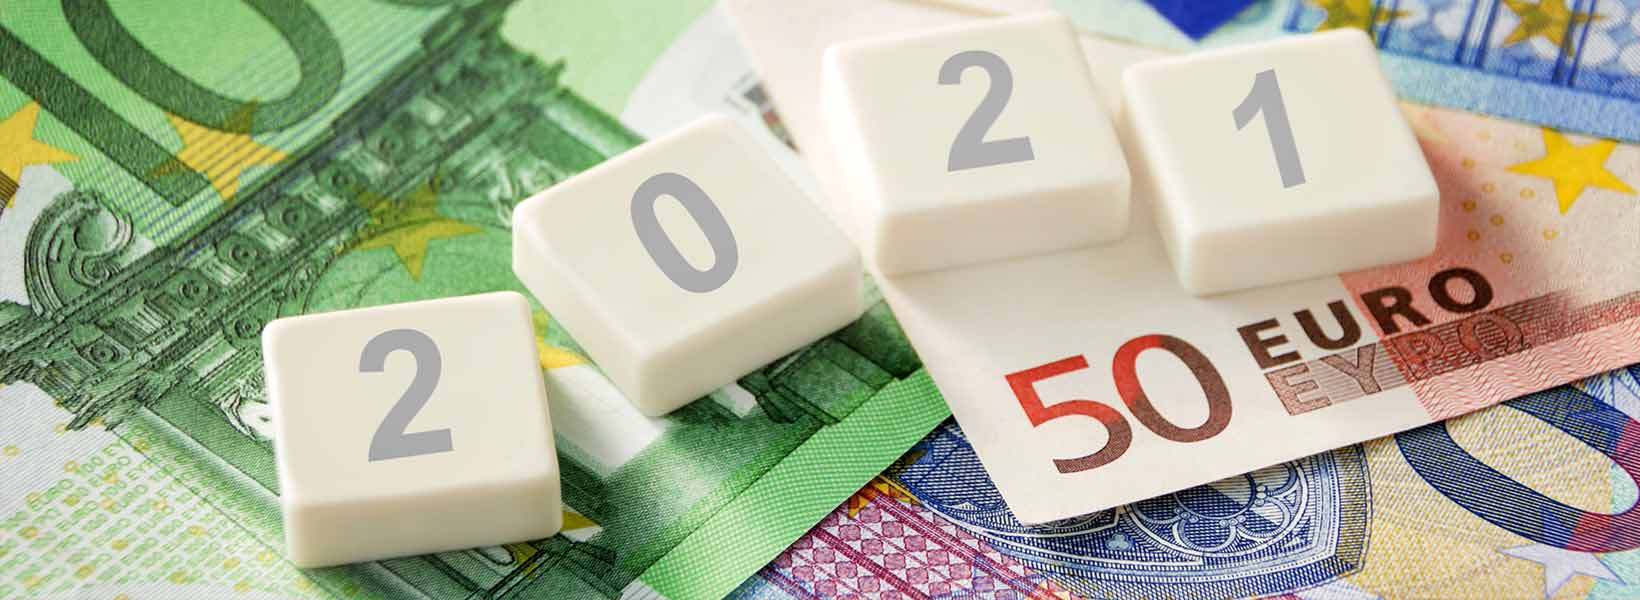 ghid fiscal jocuri de noroc 2021